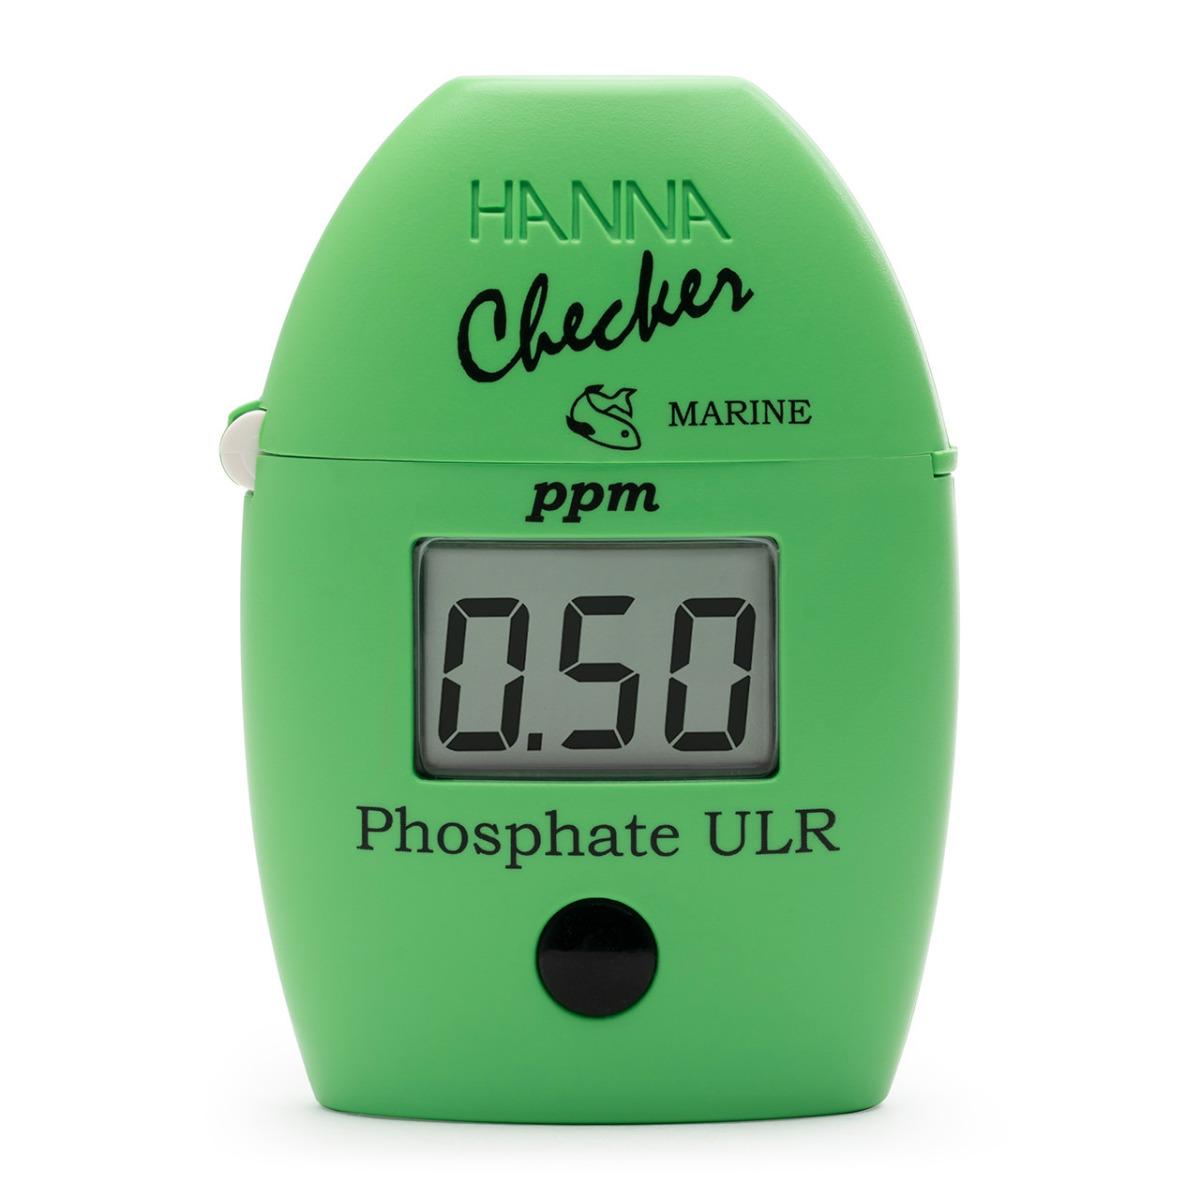 Marine Phosphate Ultra Low Range Checker® HC - HI774